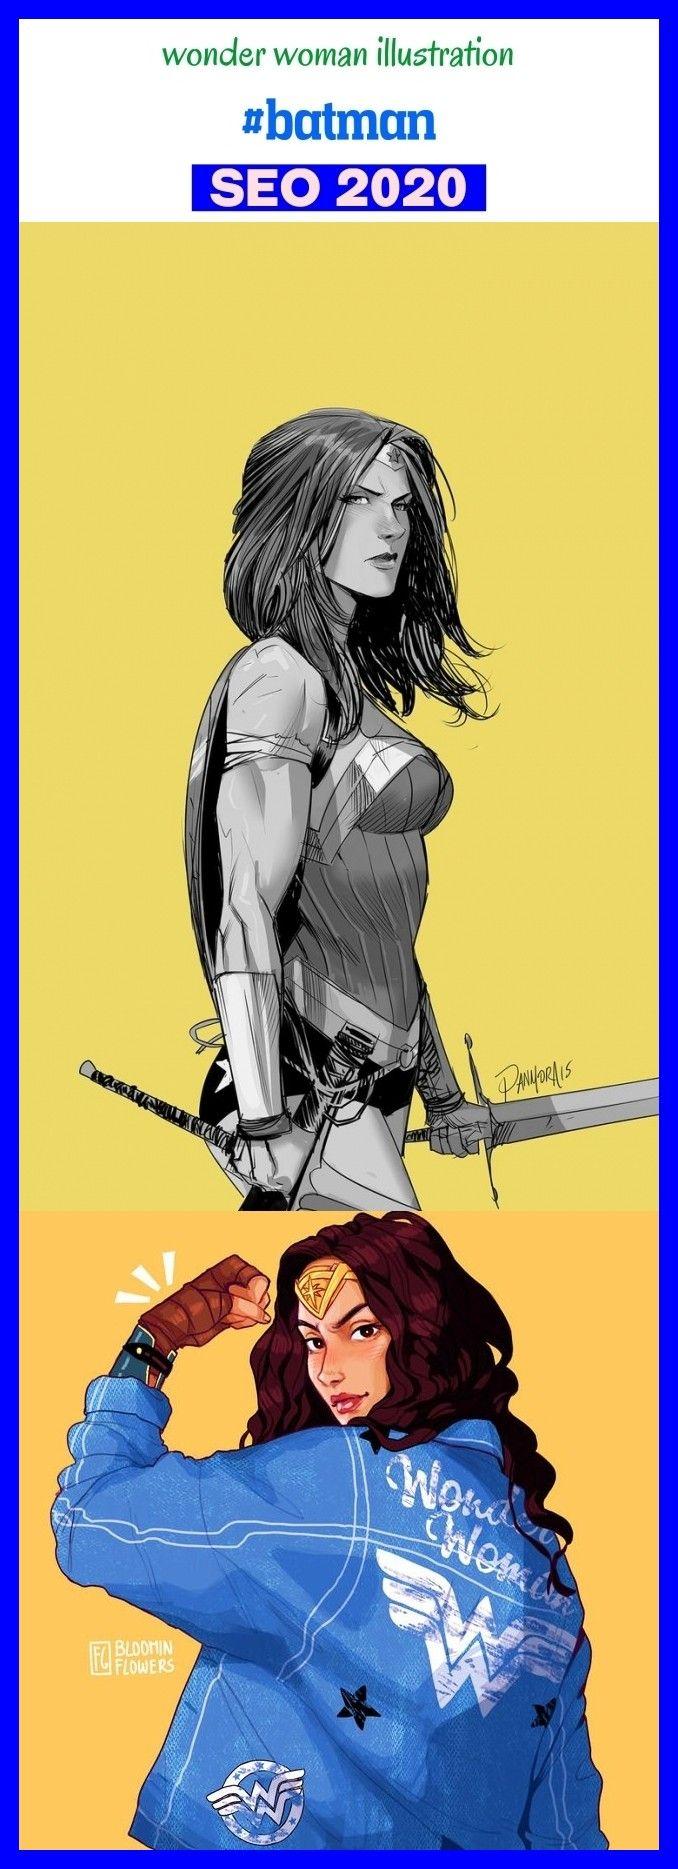 Wonder woman illustration #batman #blog #seo #geek. wonder woman costume, wonder…